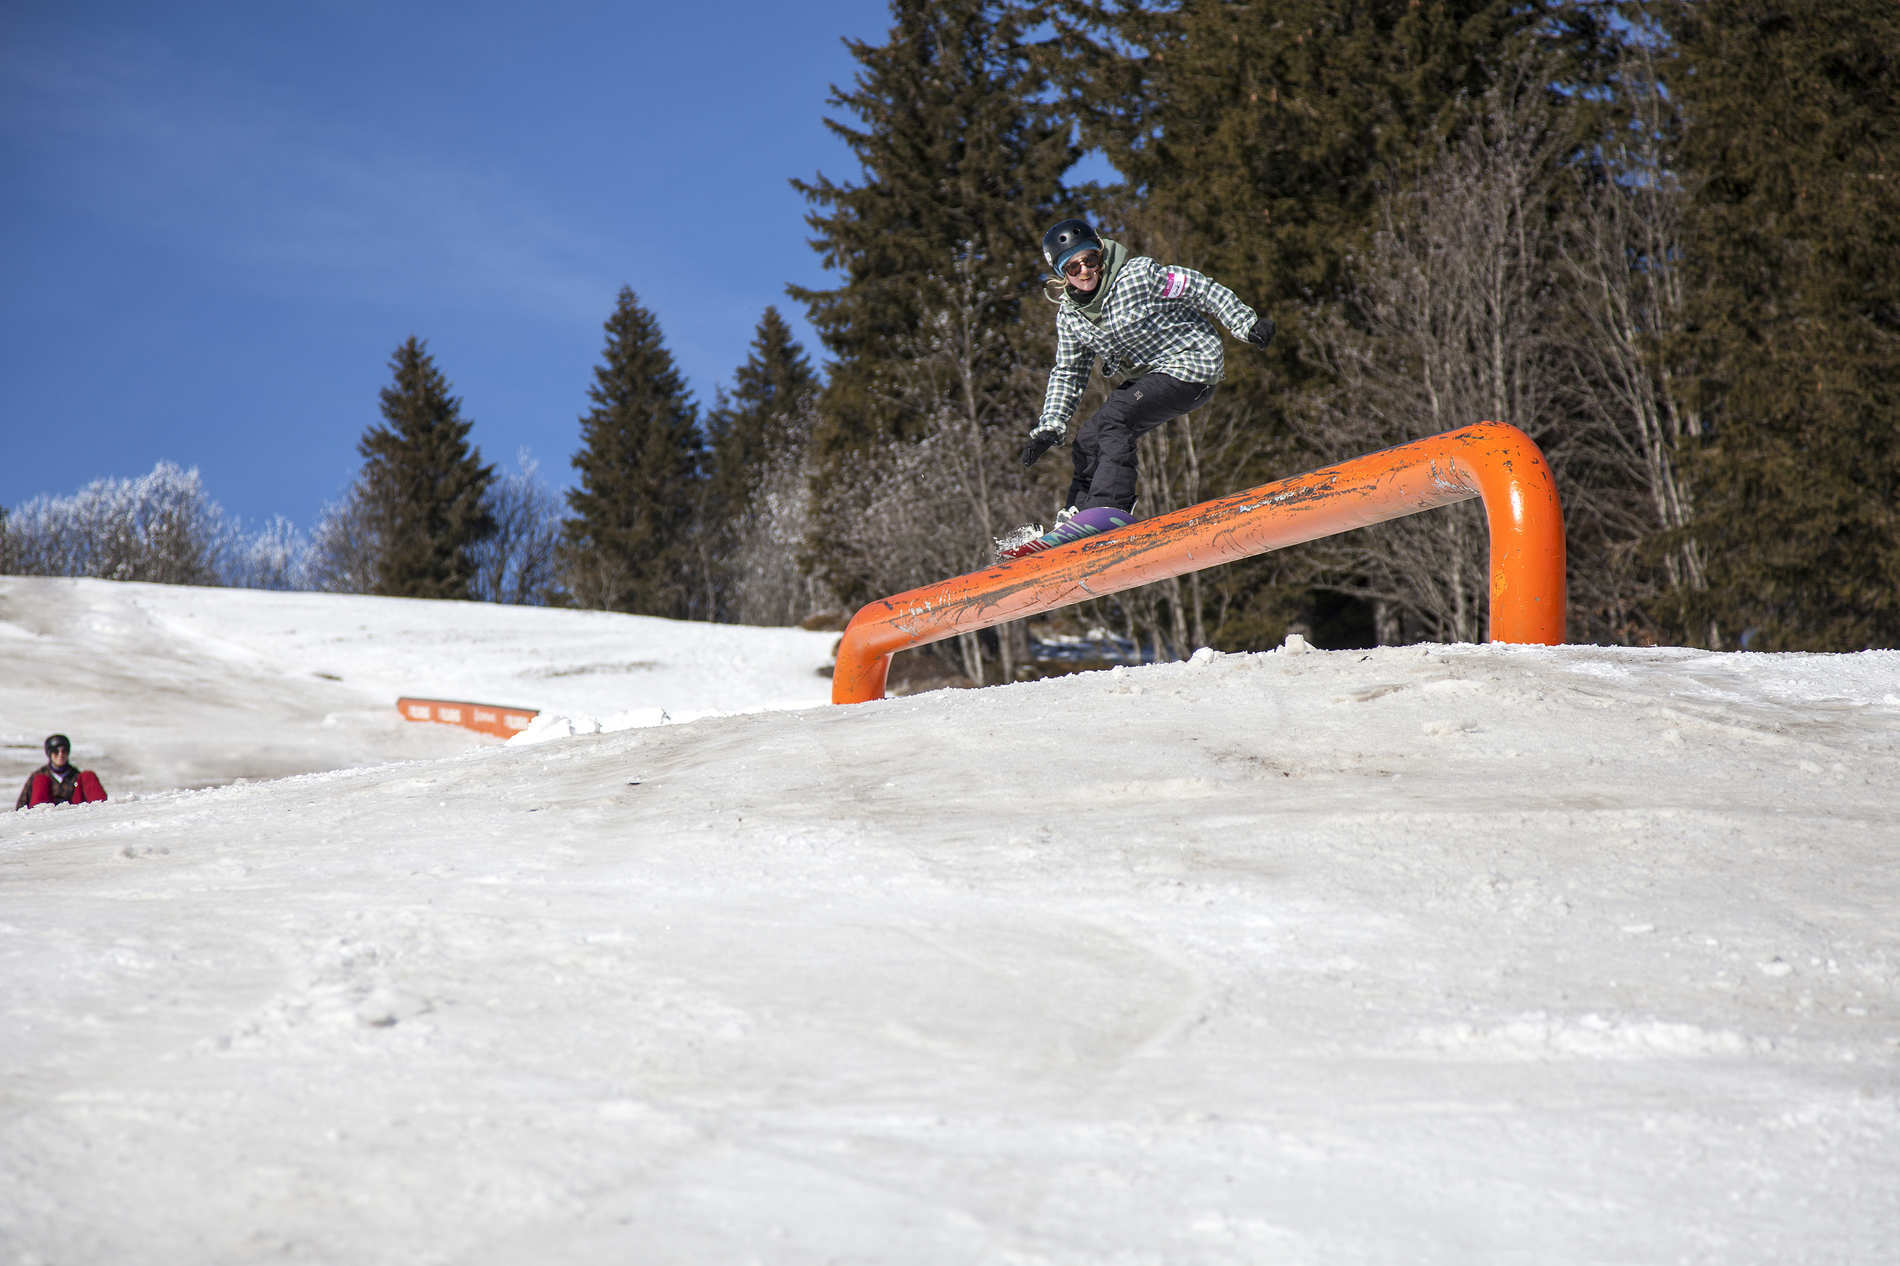 web snowpark feldberg 25 02 2017 action sb annika bartmann martin herrmann qparks 2